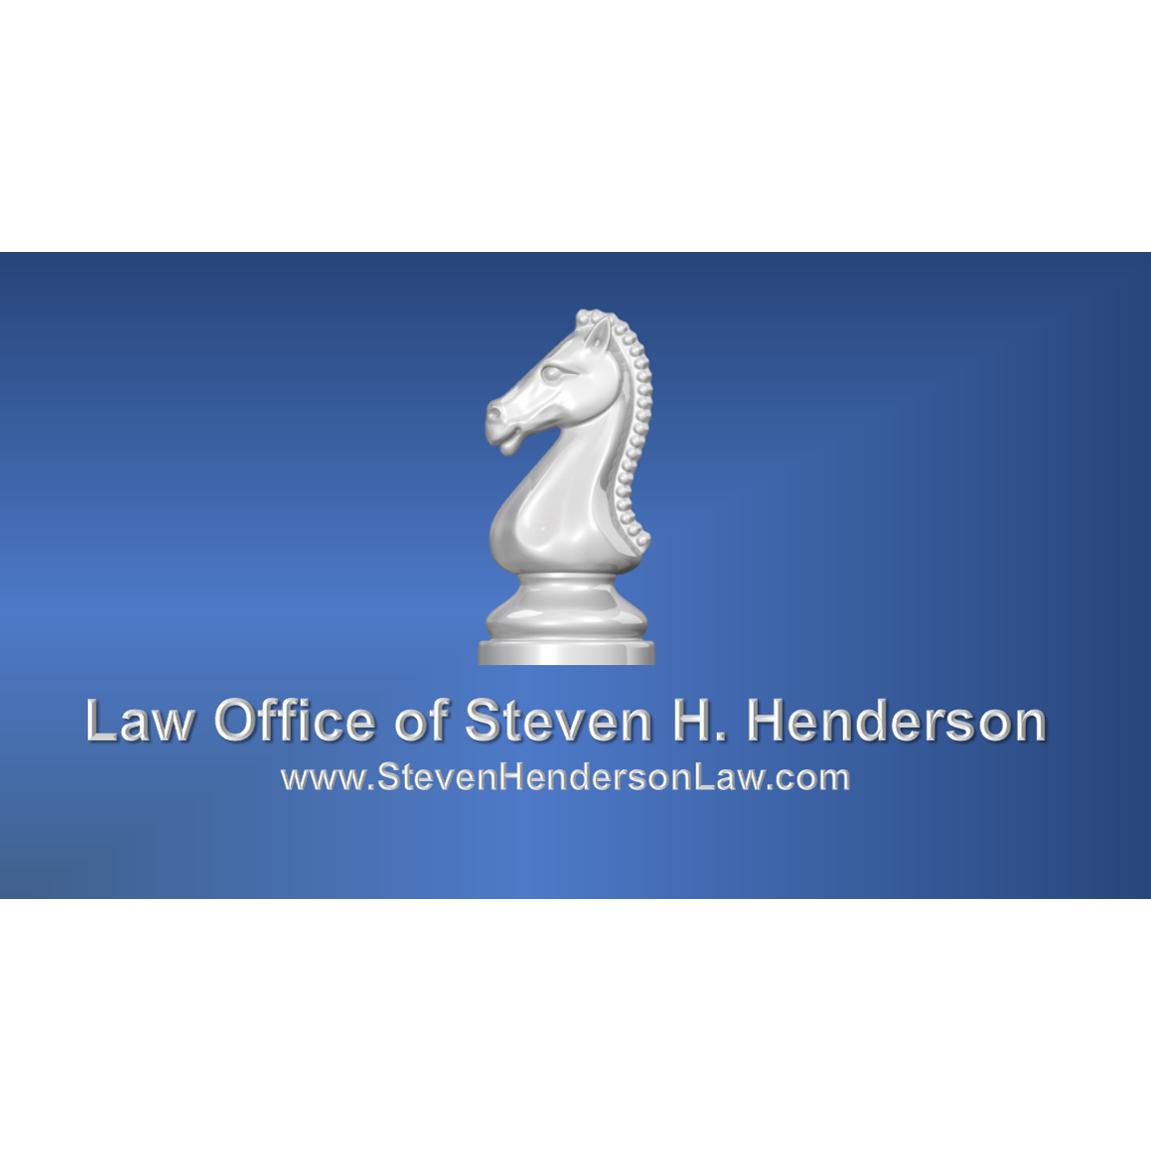 Law Office of Steven H. Henderson